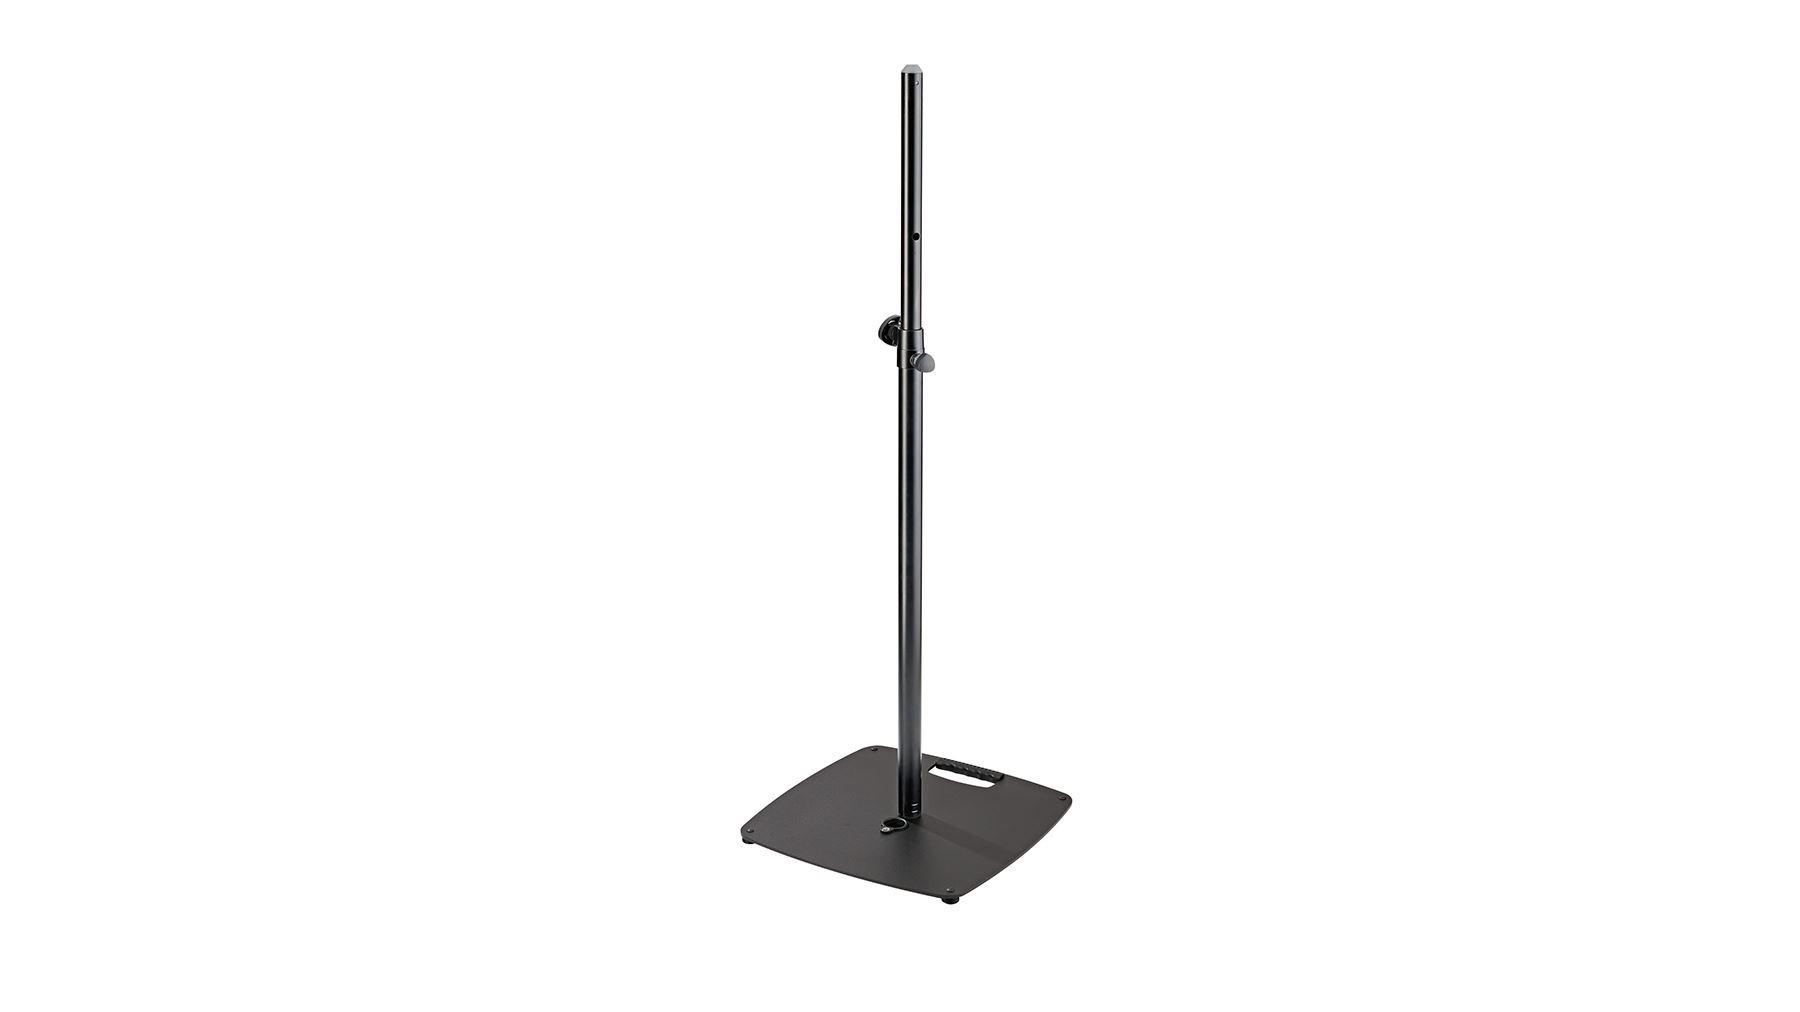 Konig & Meyer Black 26734 Flat Base Speaker Stand by K&M